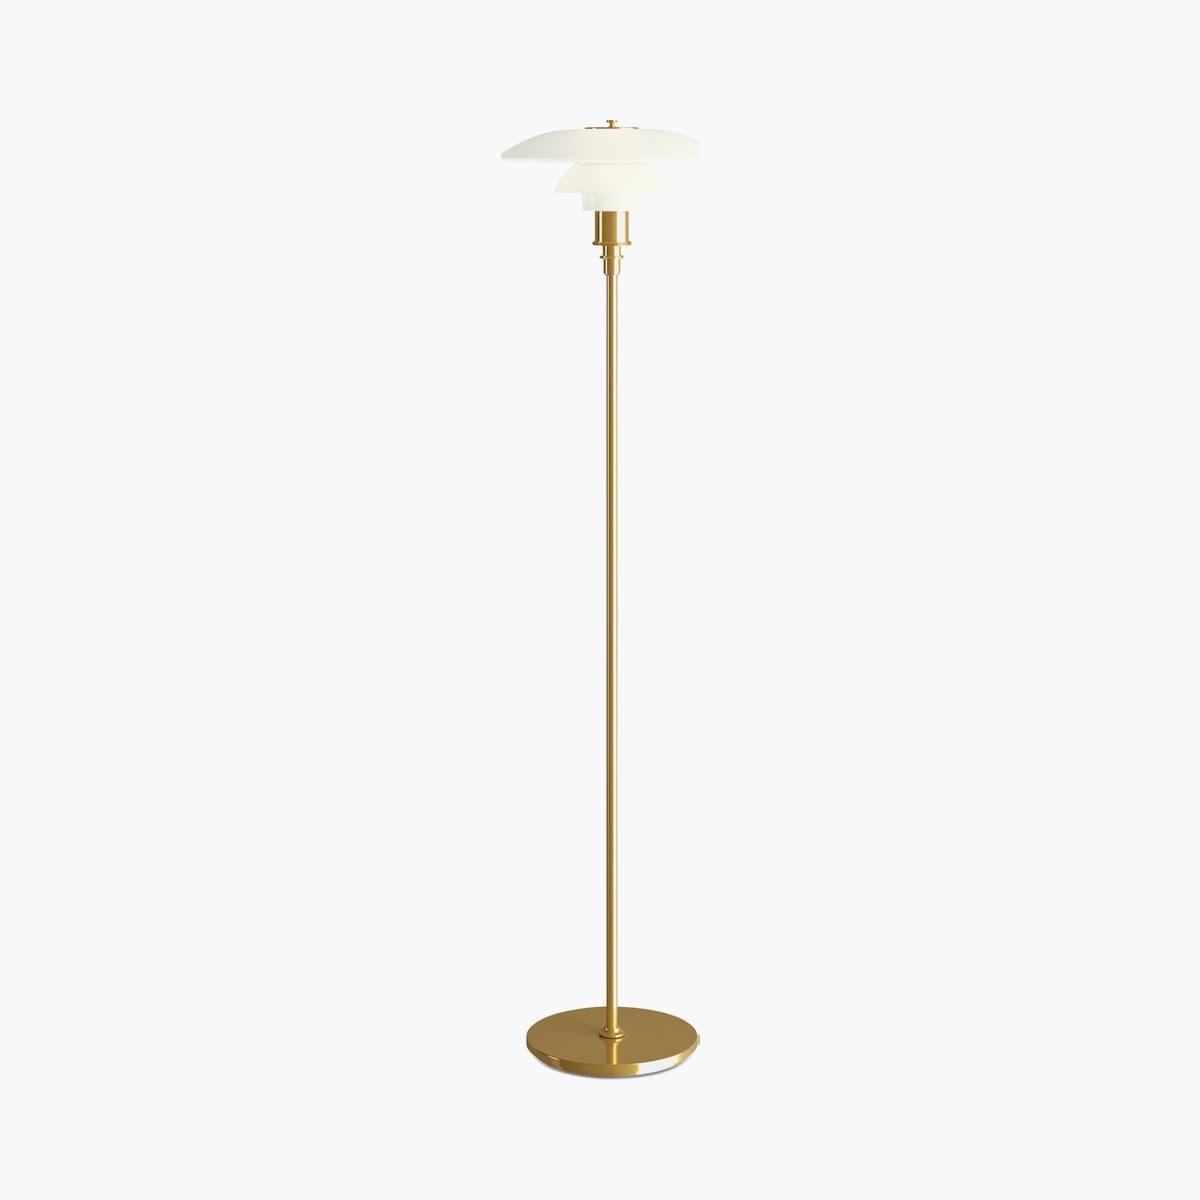 PH 3 1/2-2 1/2 Floor Lamp